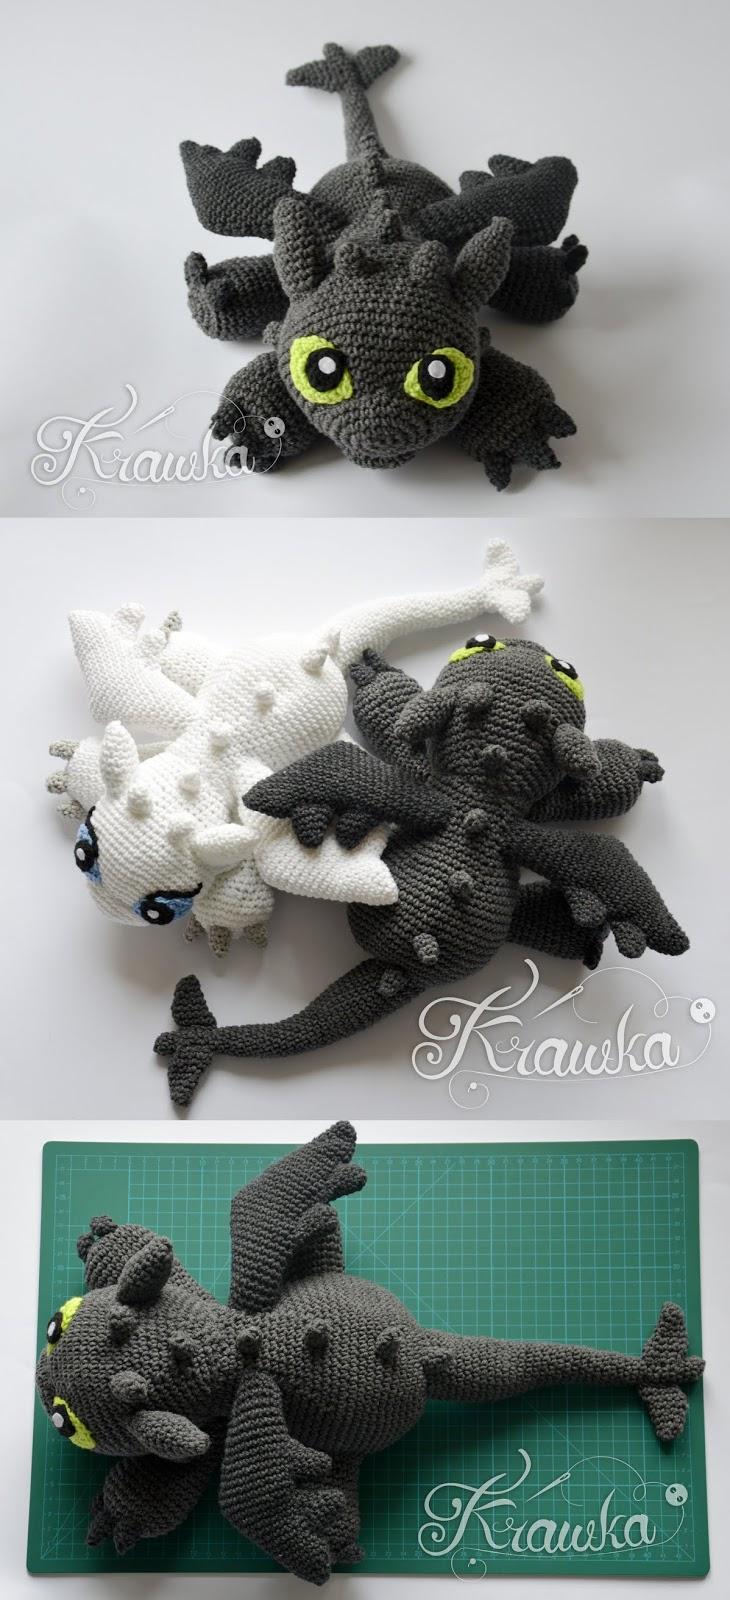 Vincent the Dragon | Free Crochet Pattern Amigurumi | Hooked by Kati | 1600x730